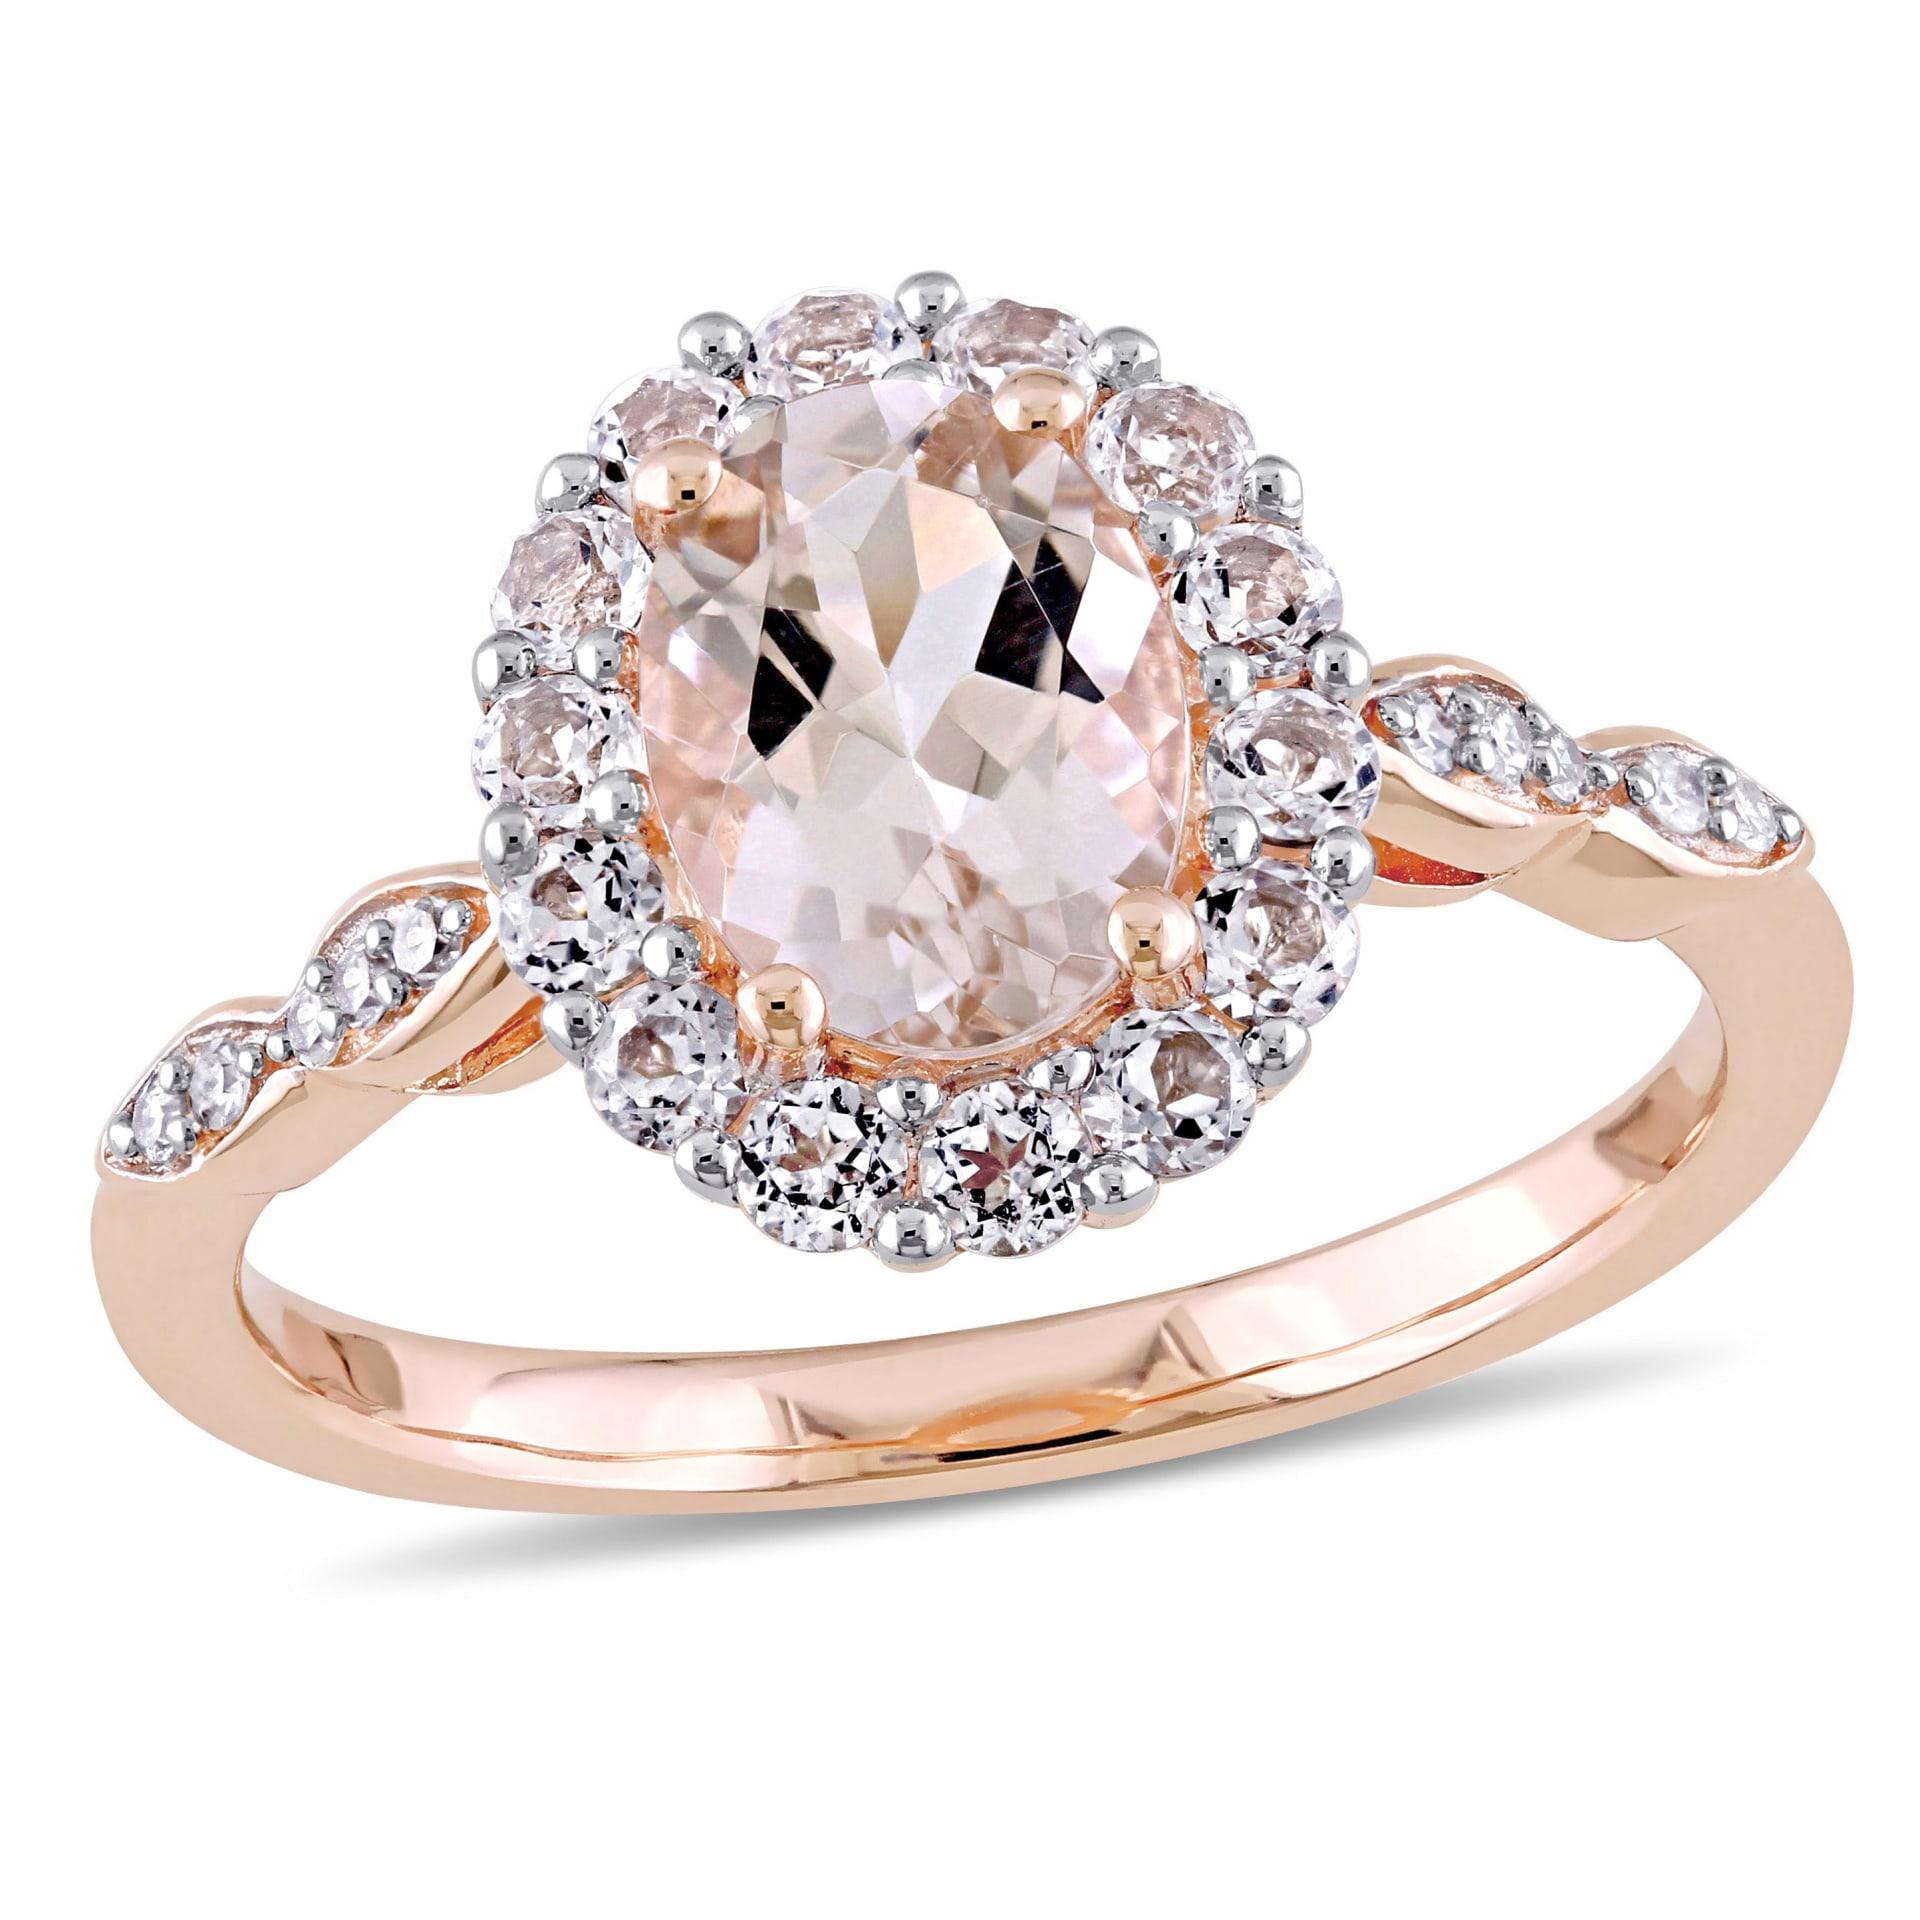 14k White Gold White Topaz Gemstone Ring with Diamond Halo